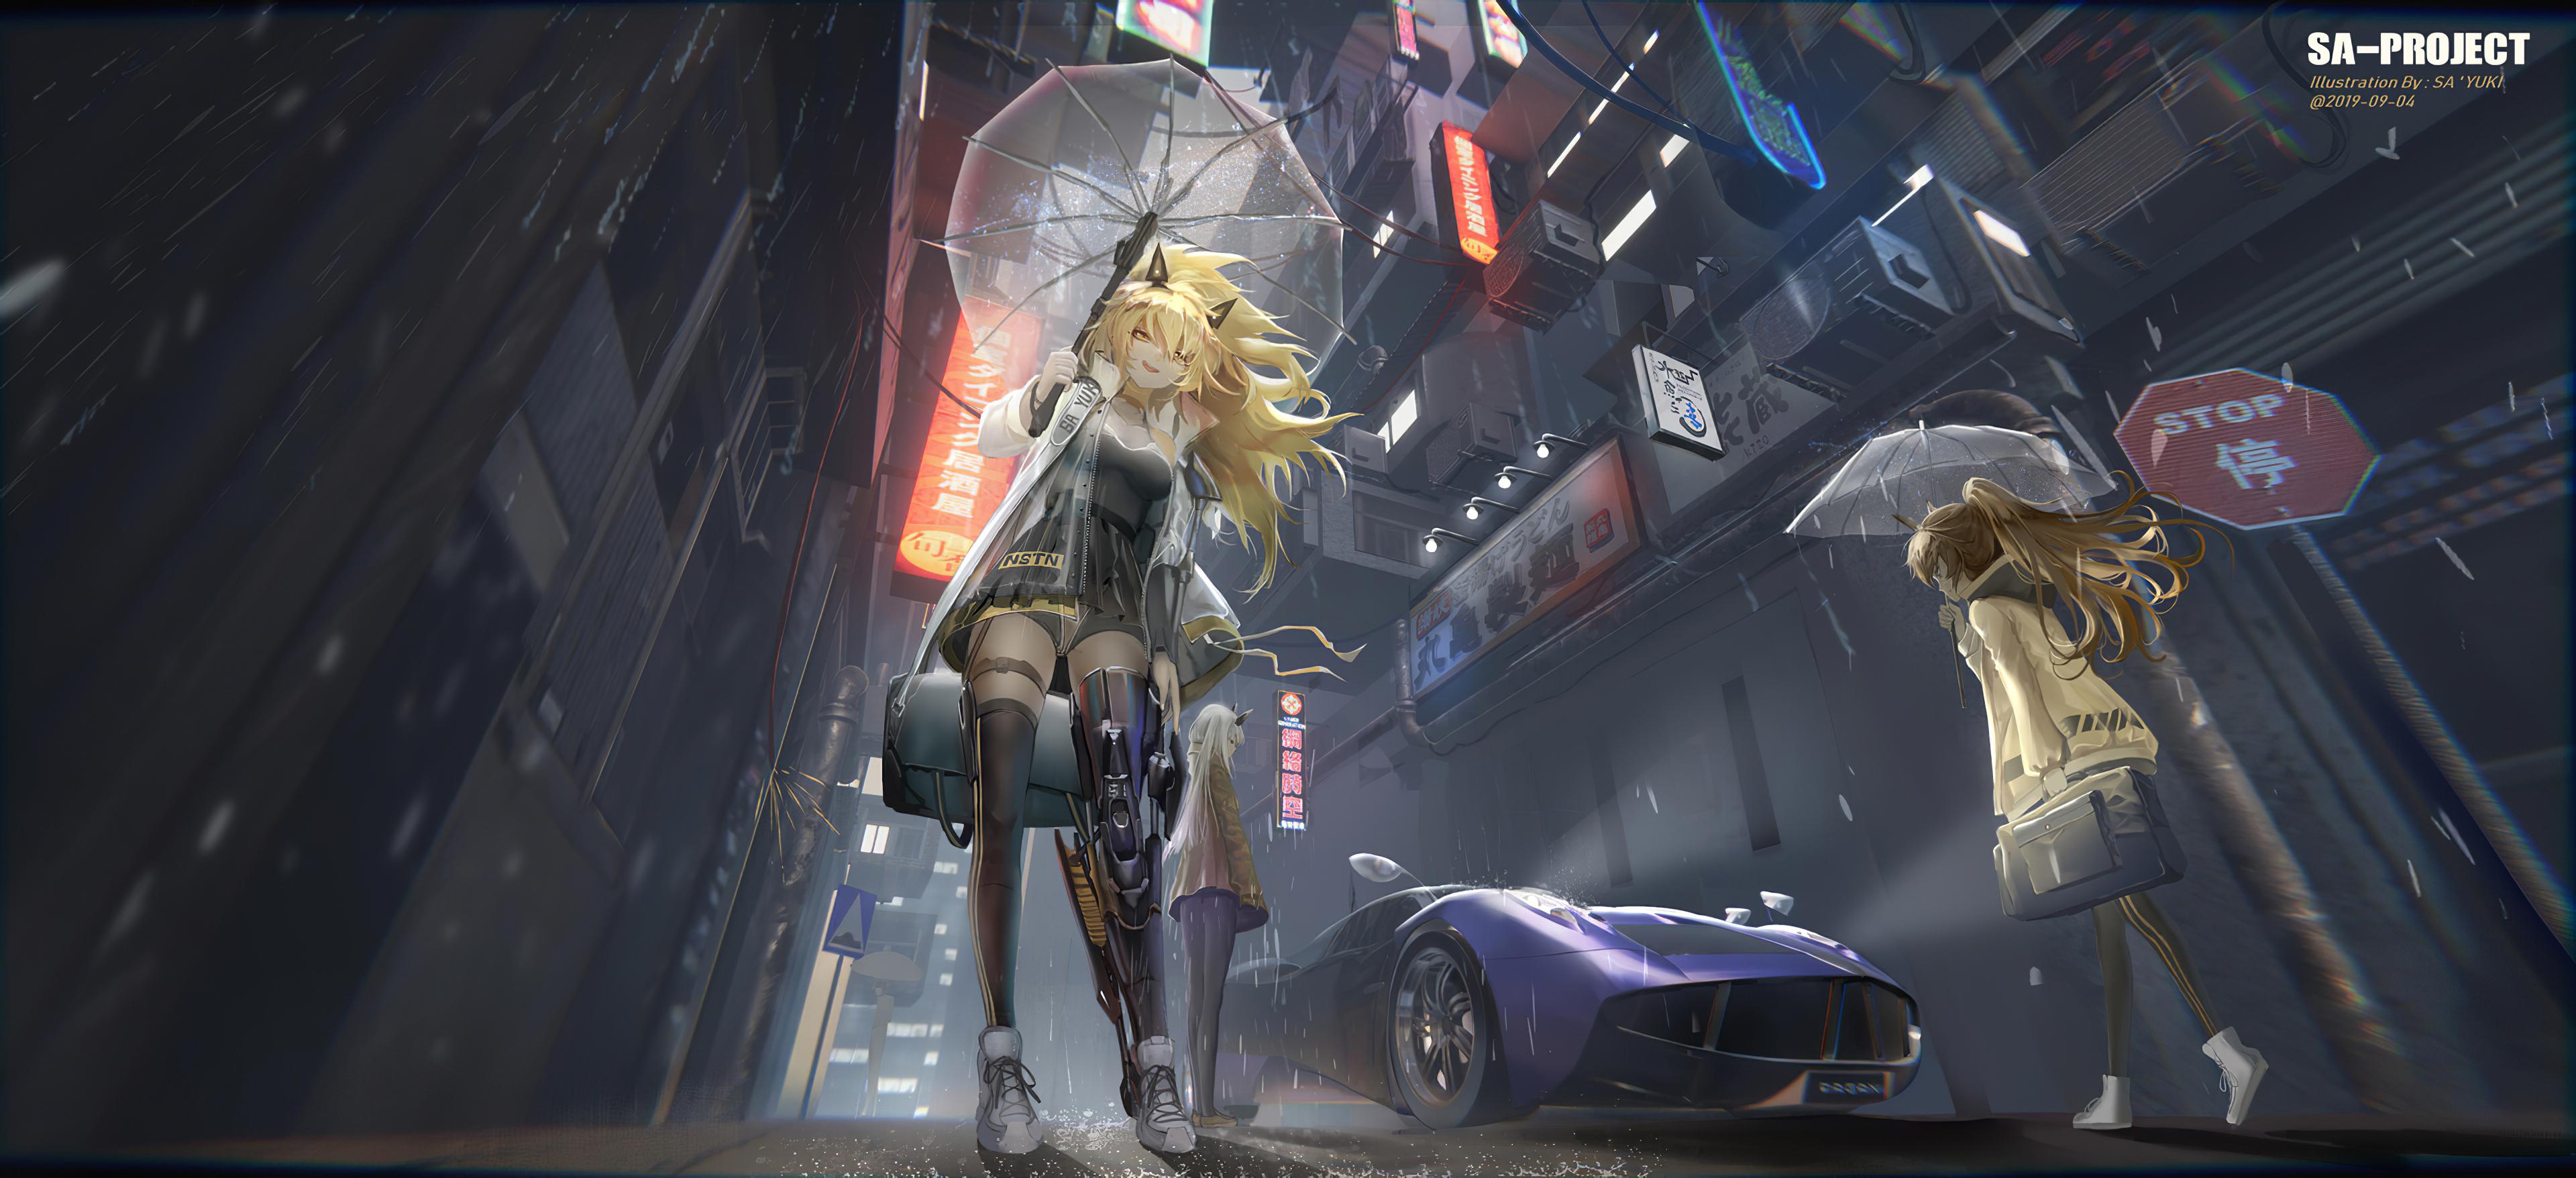 honkong city anime girls 1578254410 - Honkong City Anime Girls -